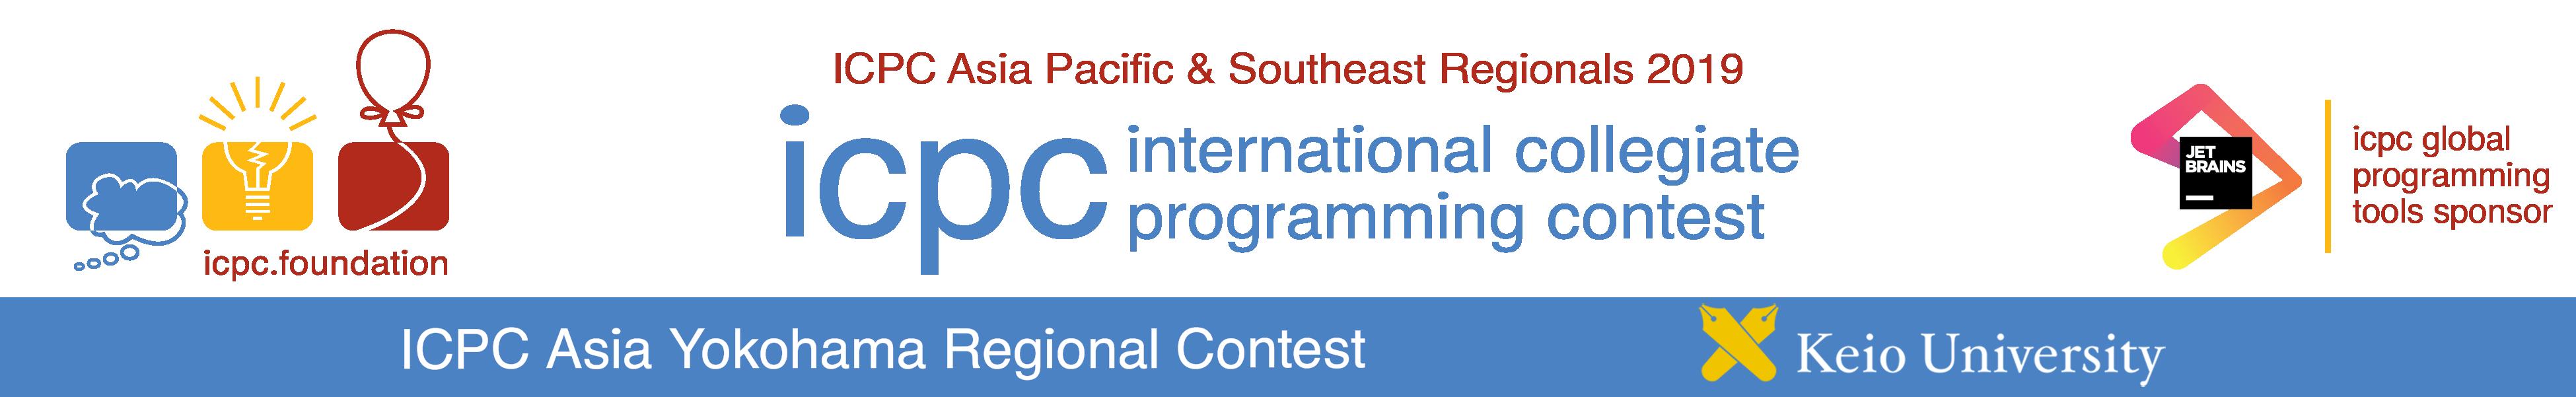 ICPC 2019 Asia Yokohama Regional